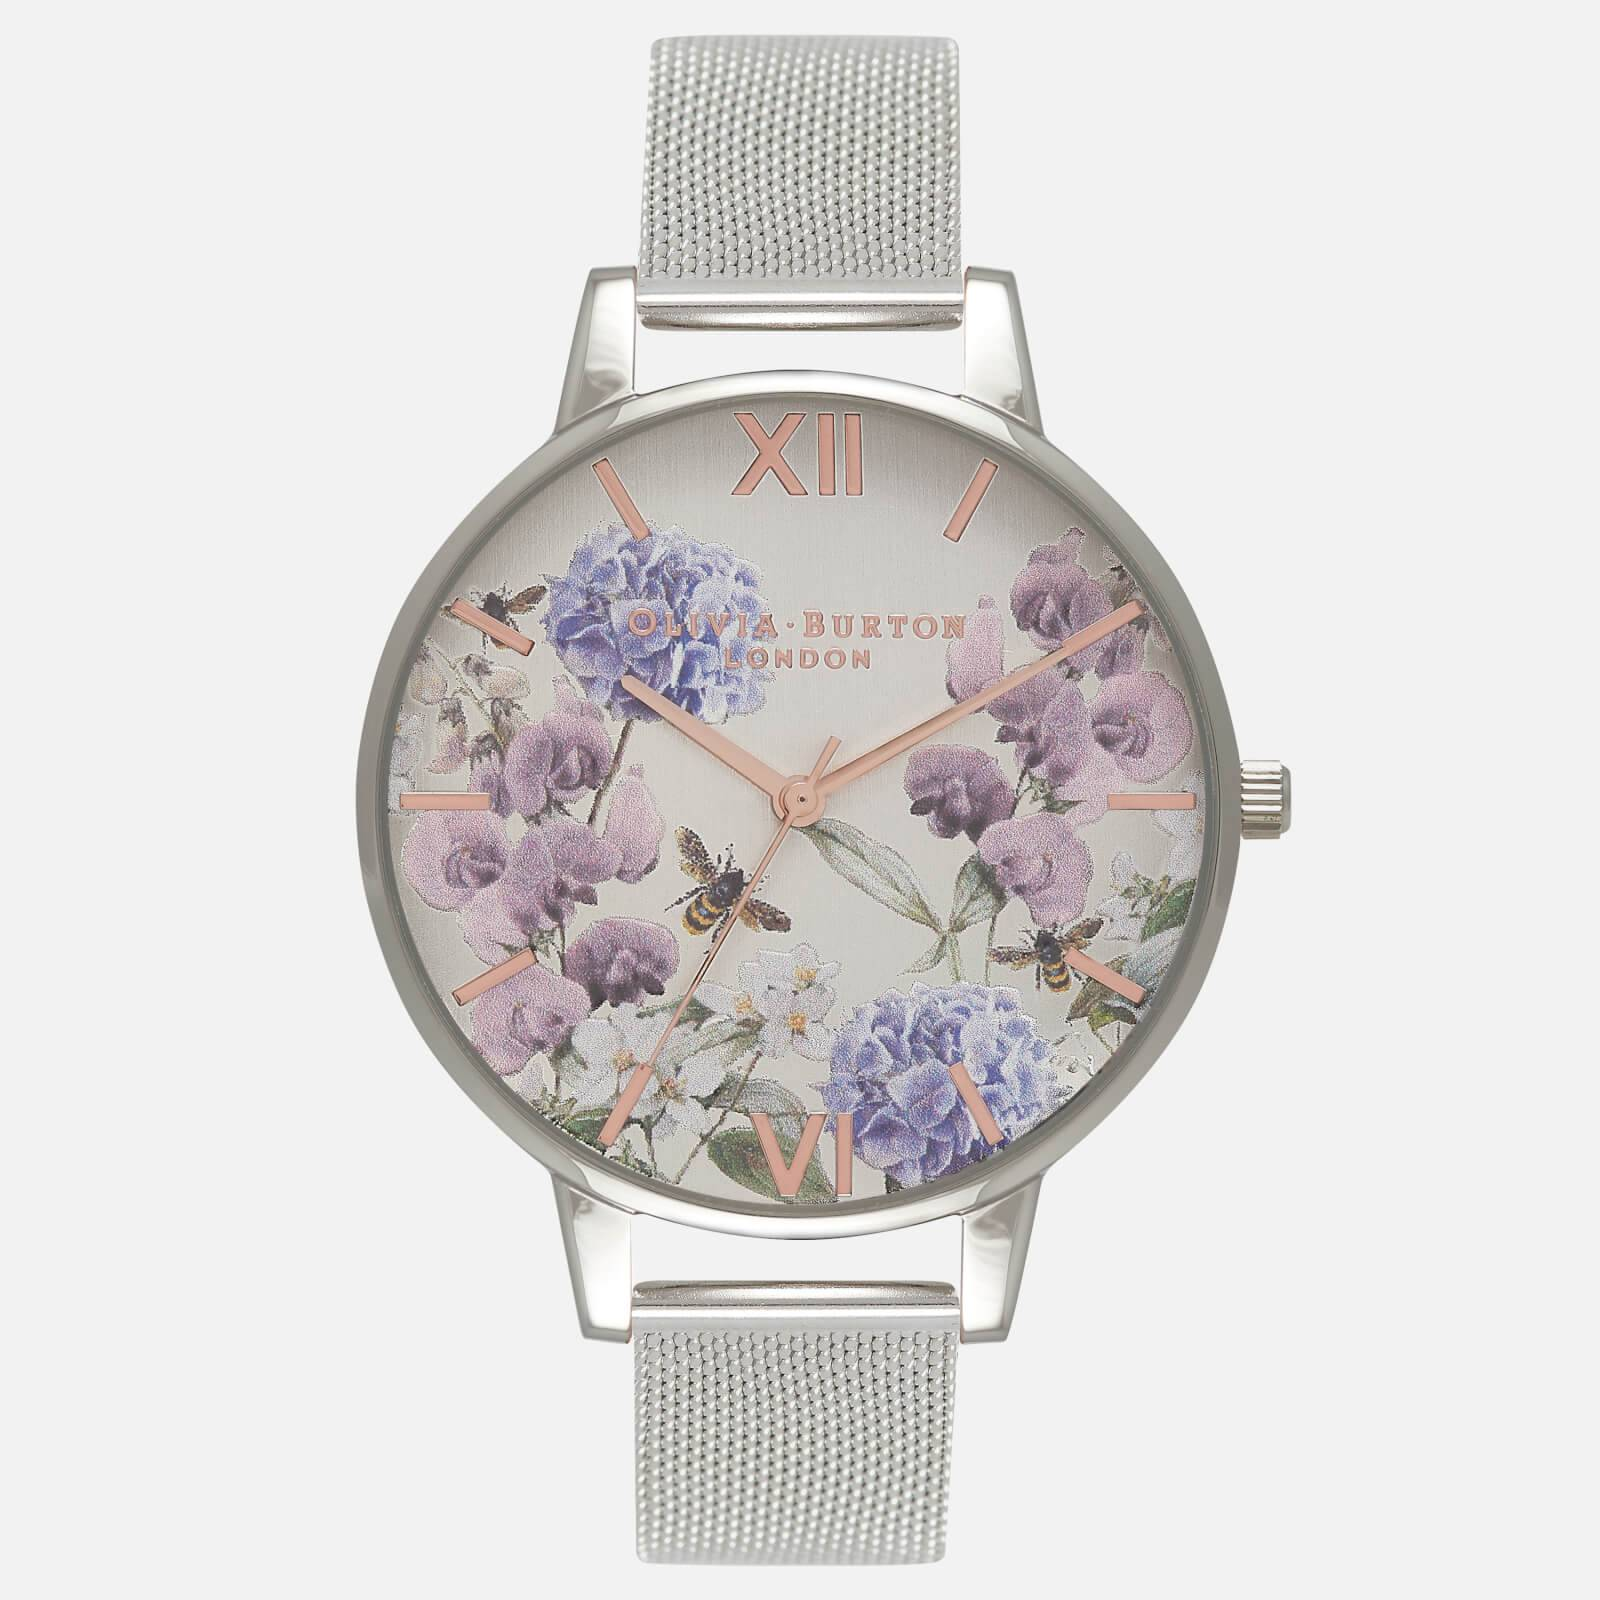 Olivia Burton Women's Parlour Bee Blooms Watch - Enchanted Garden